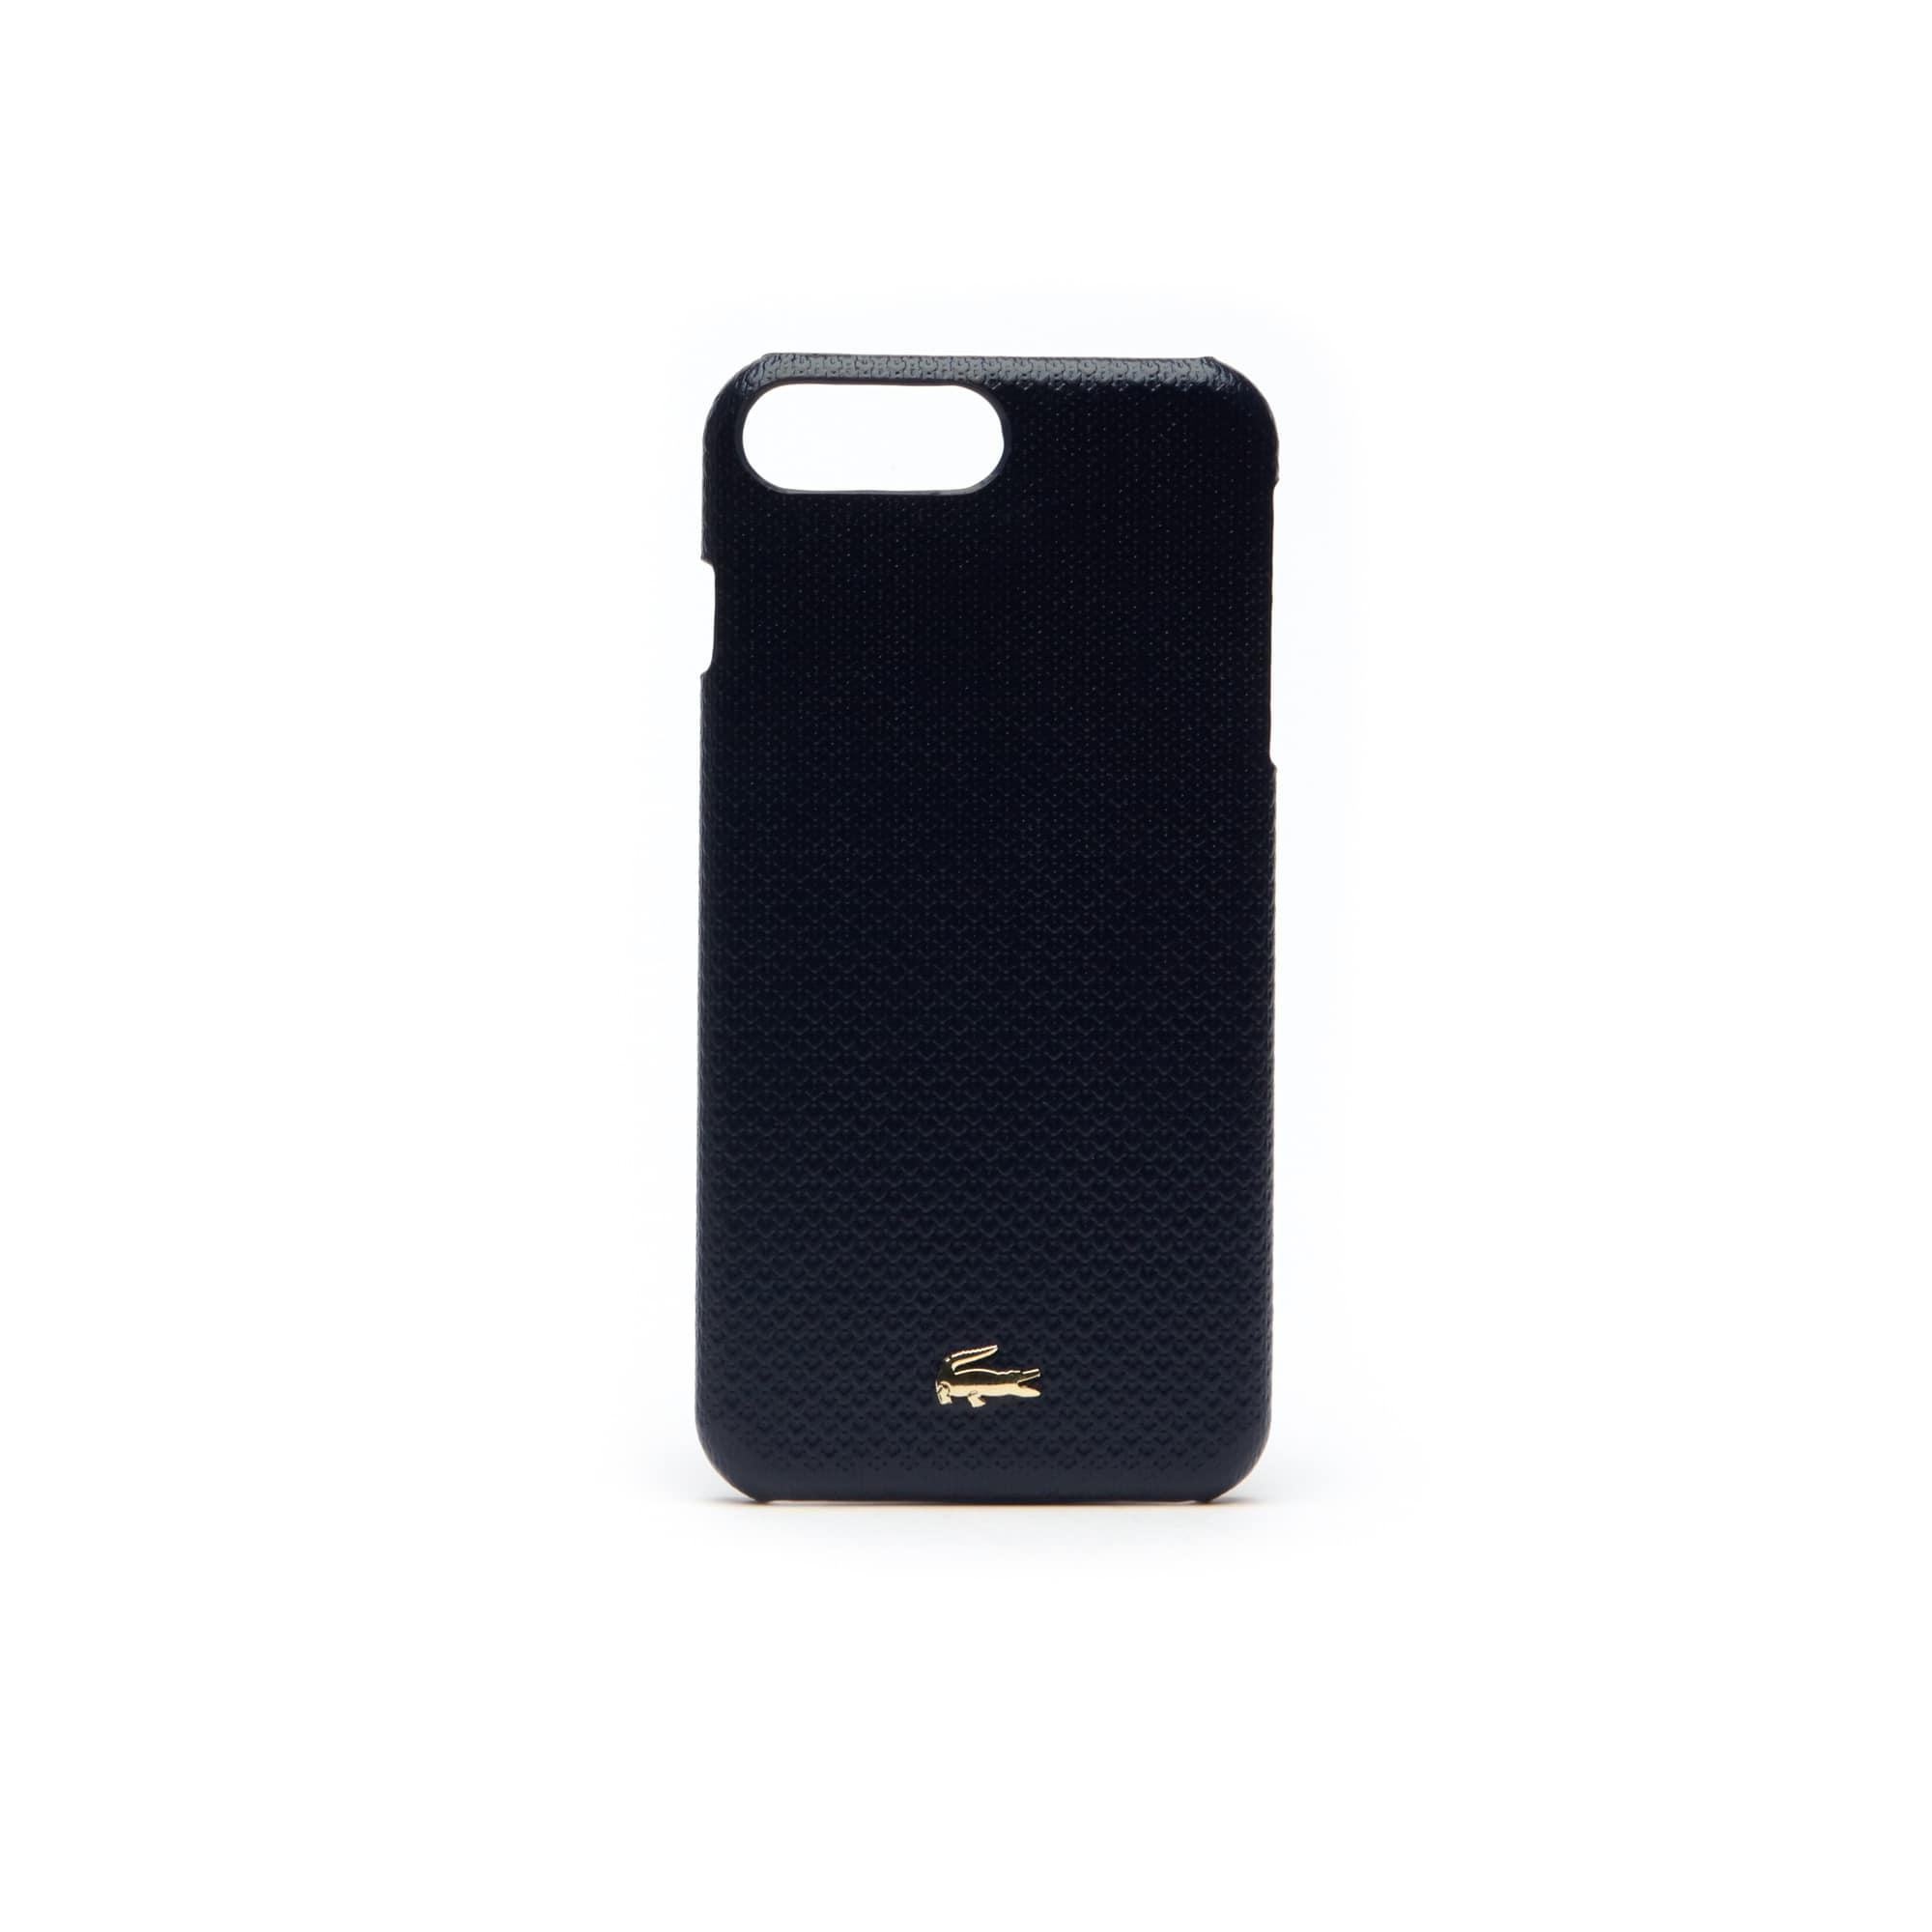 Capa para iPhone 8+ Chantaco em piqué